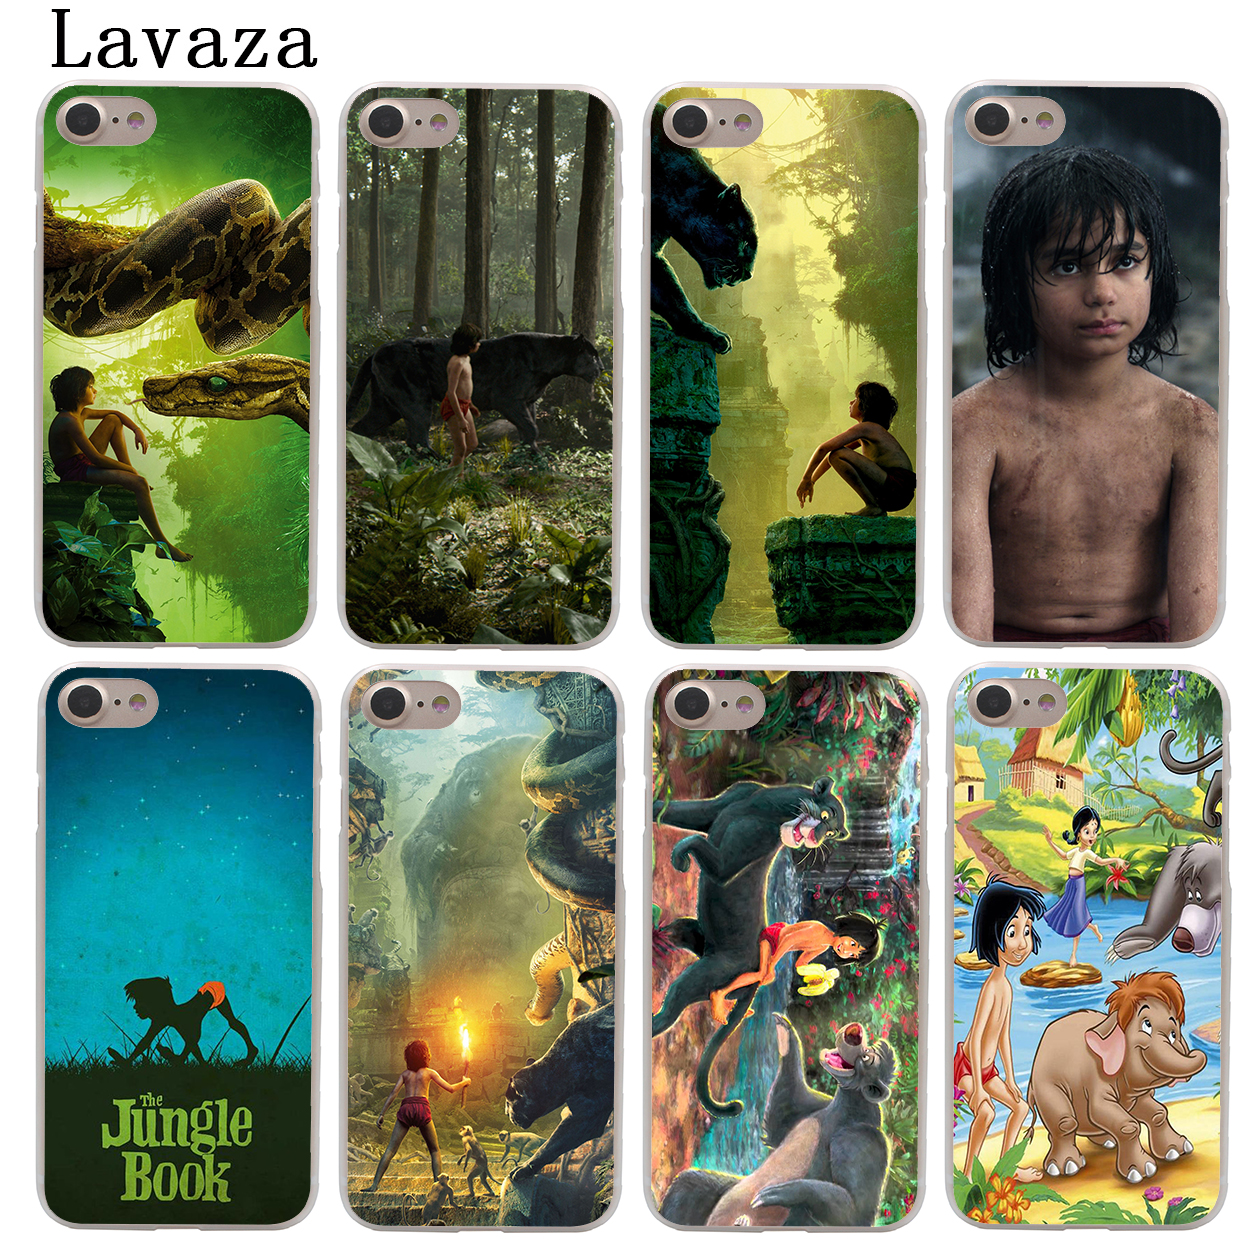 Lavaza The Jungle Book Hard Fashion Phone Skin Shell Case for Apple iPhone X 10 8 7 6 6S Plus 5 5S SE 5C 4 4S Cover